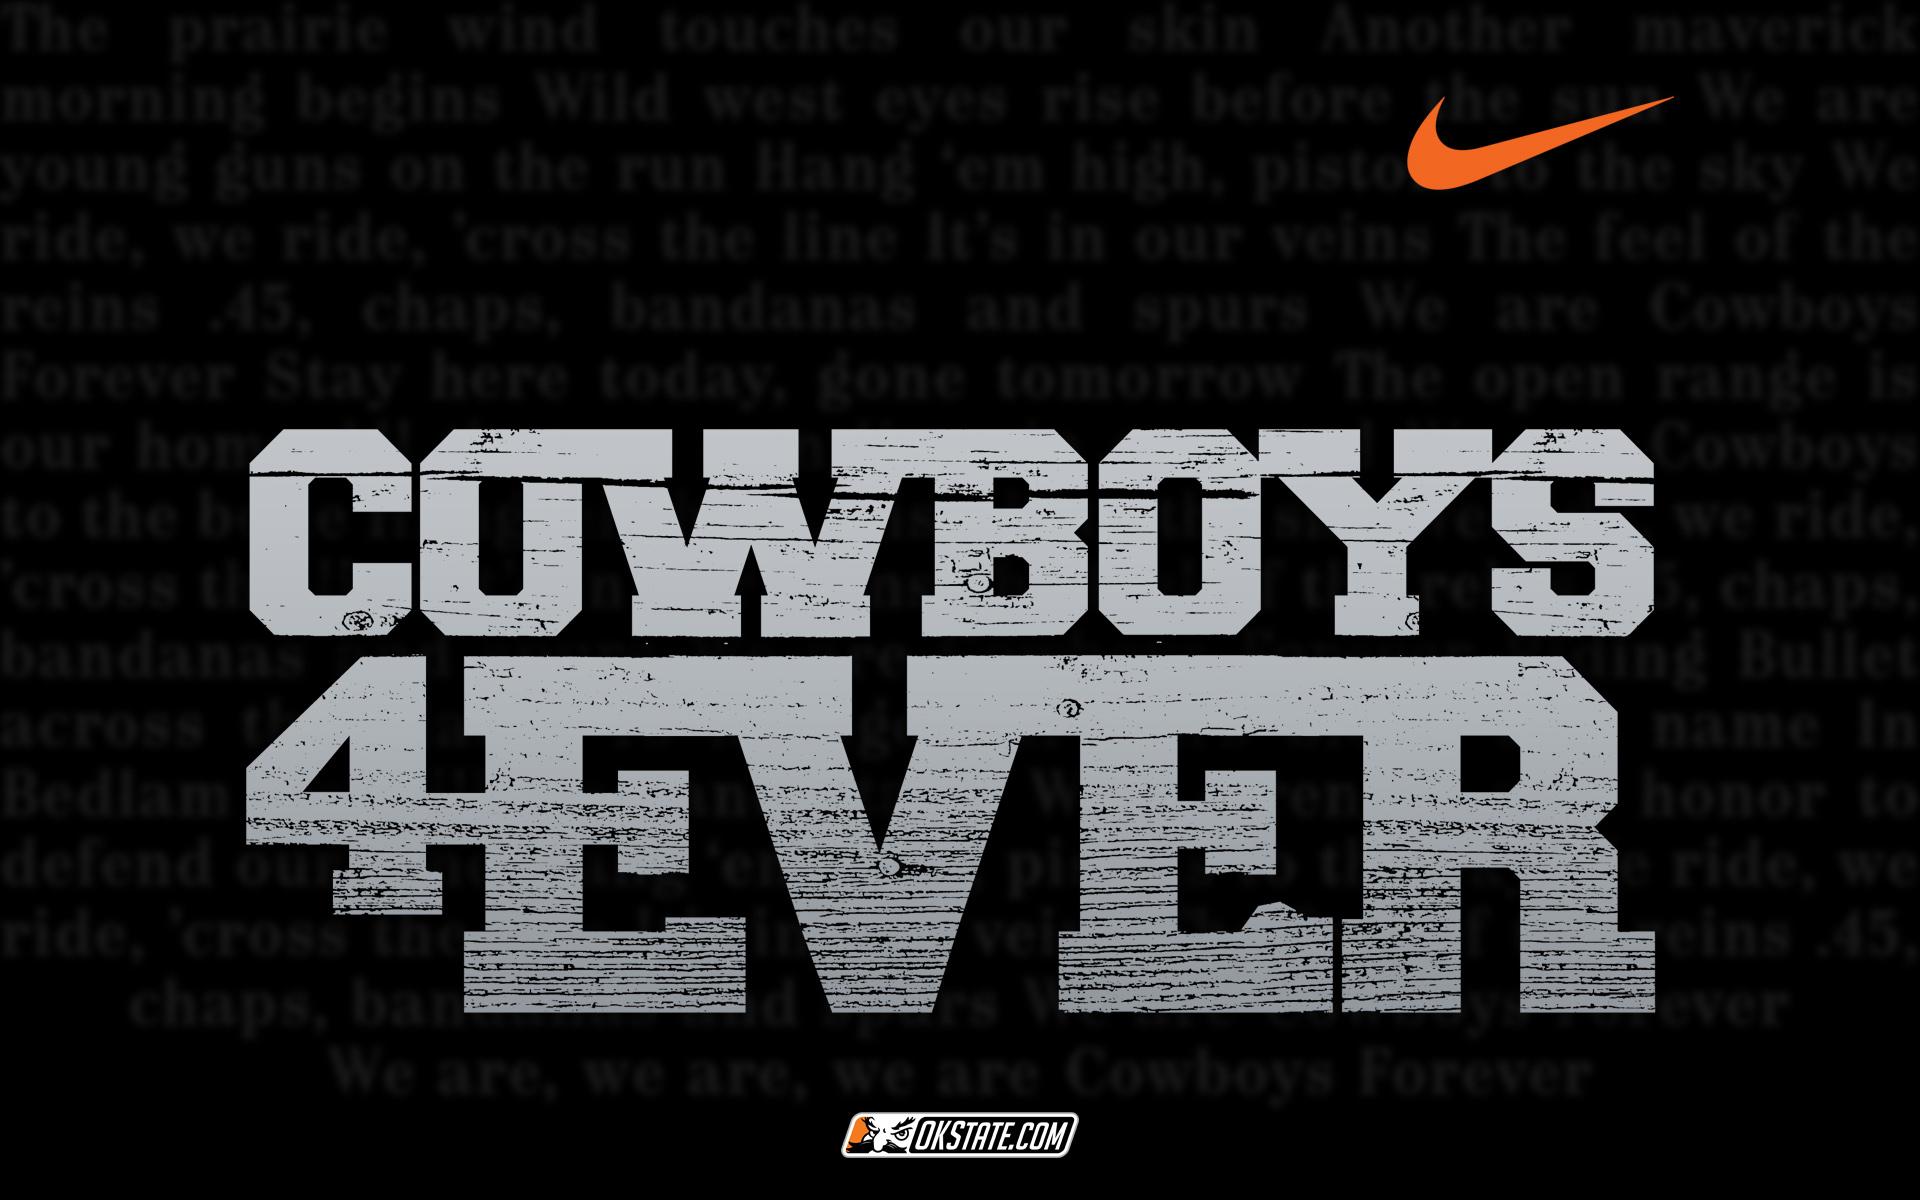 Cowboys Wallpaper, Top 39 Quality Cool Cowboys Wallpapers | LL GL